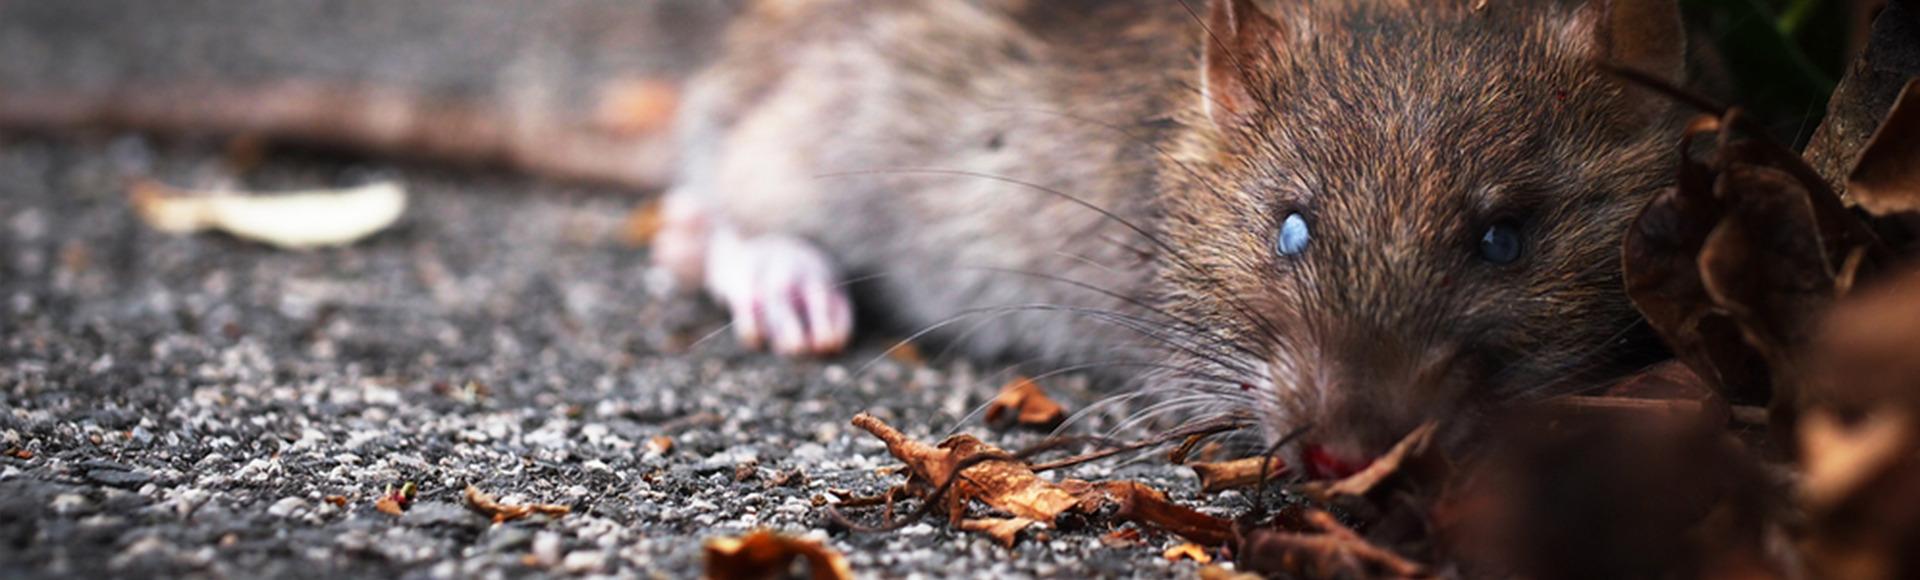 Pest-Control-North-London-Rat-1920x580